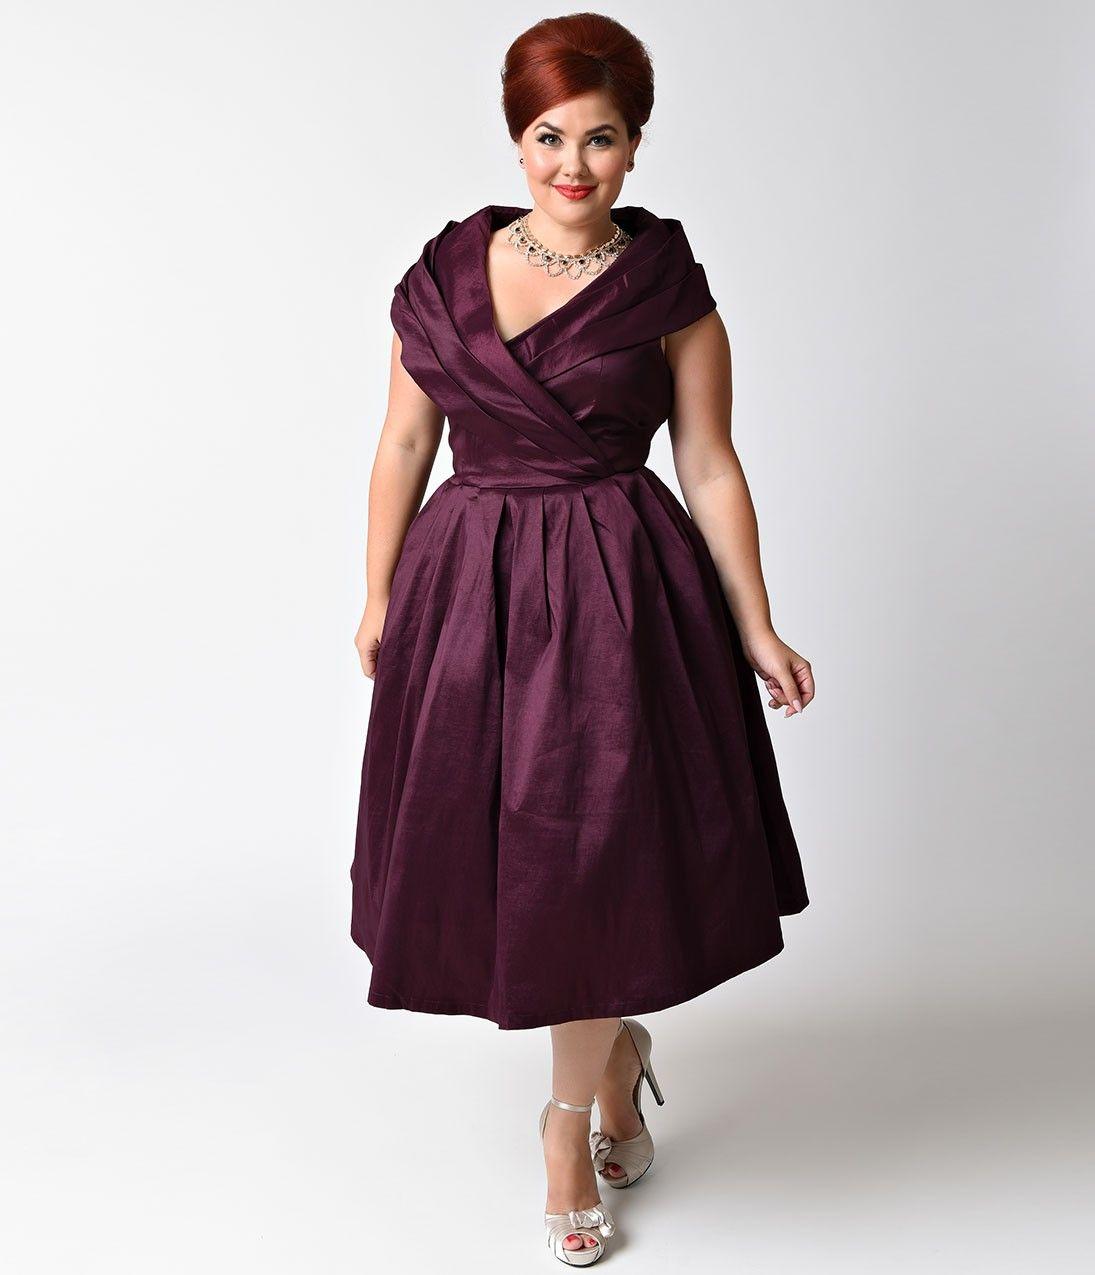 Lindy Bop Plus Size Vintage Style Purple Stretch Amber